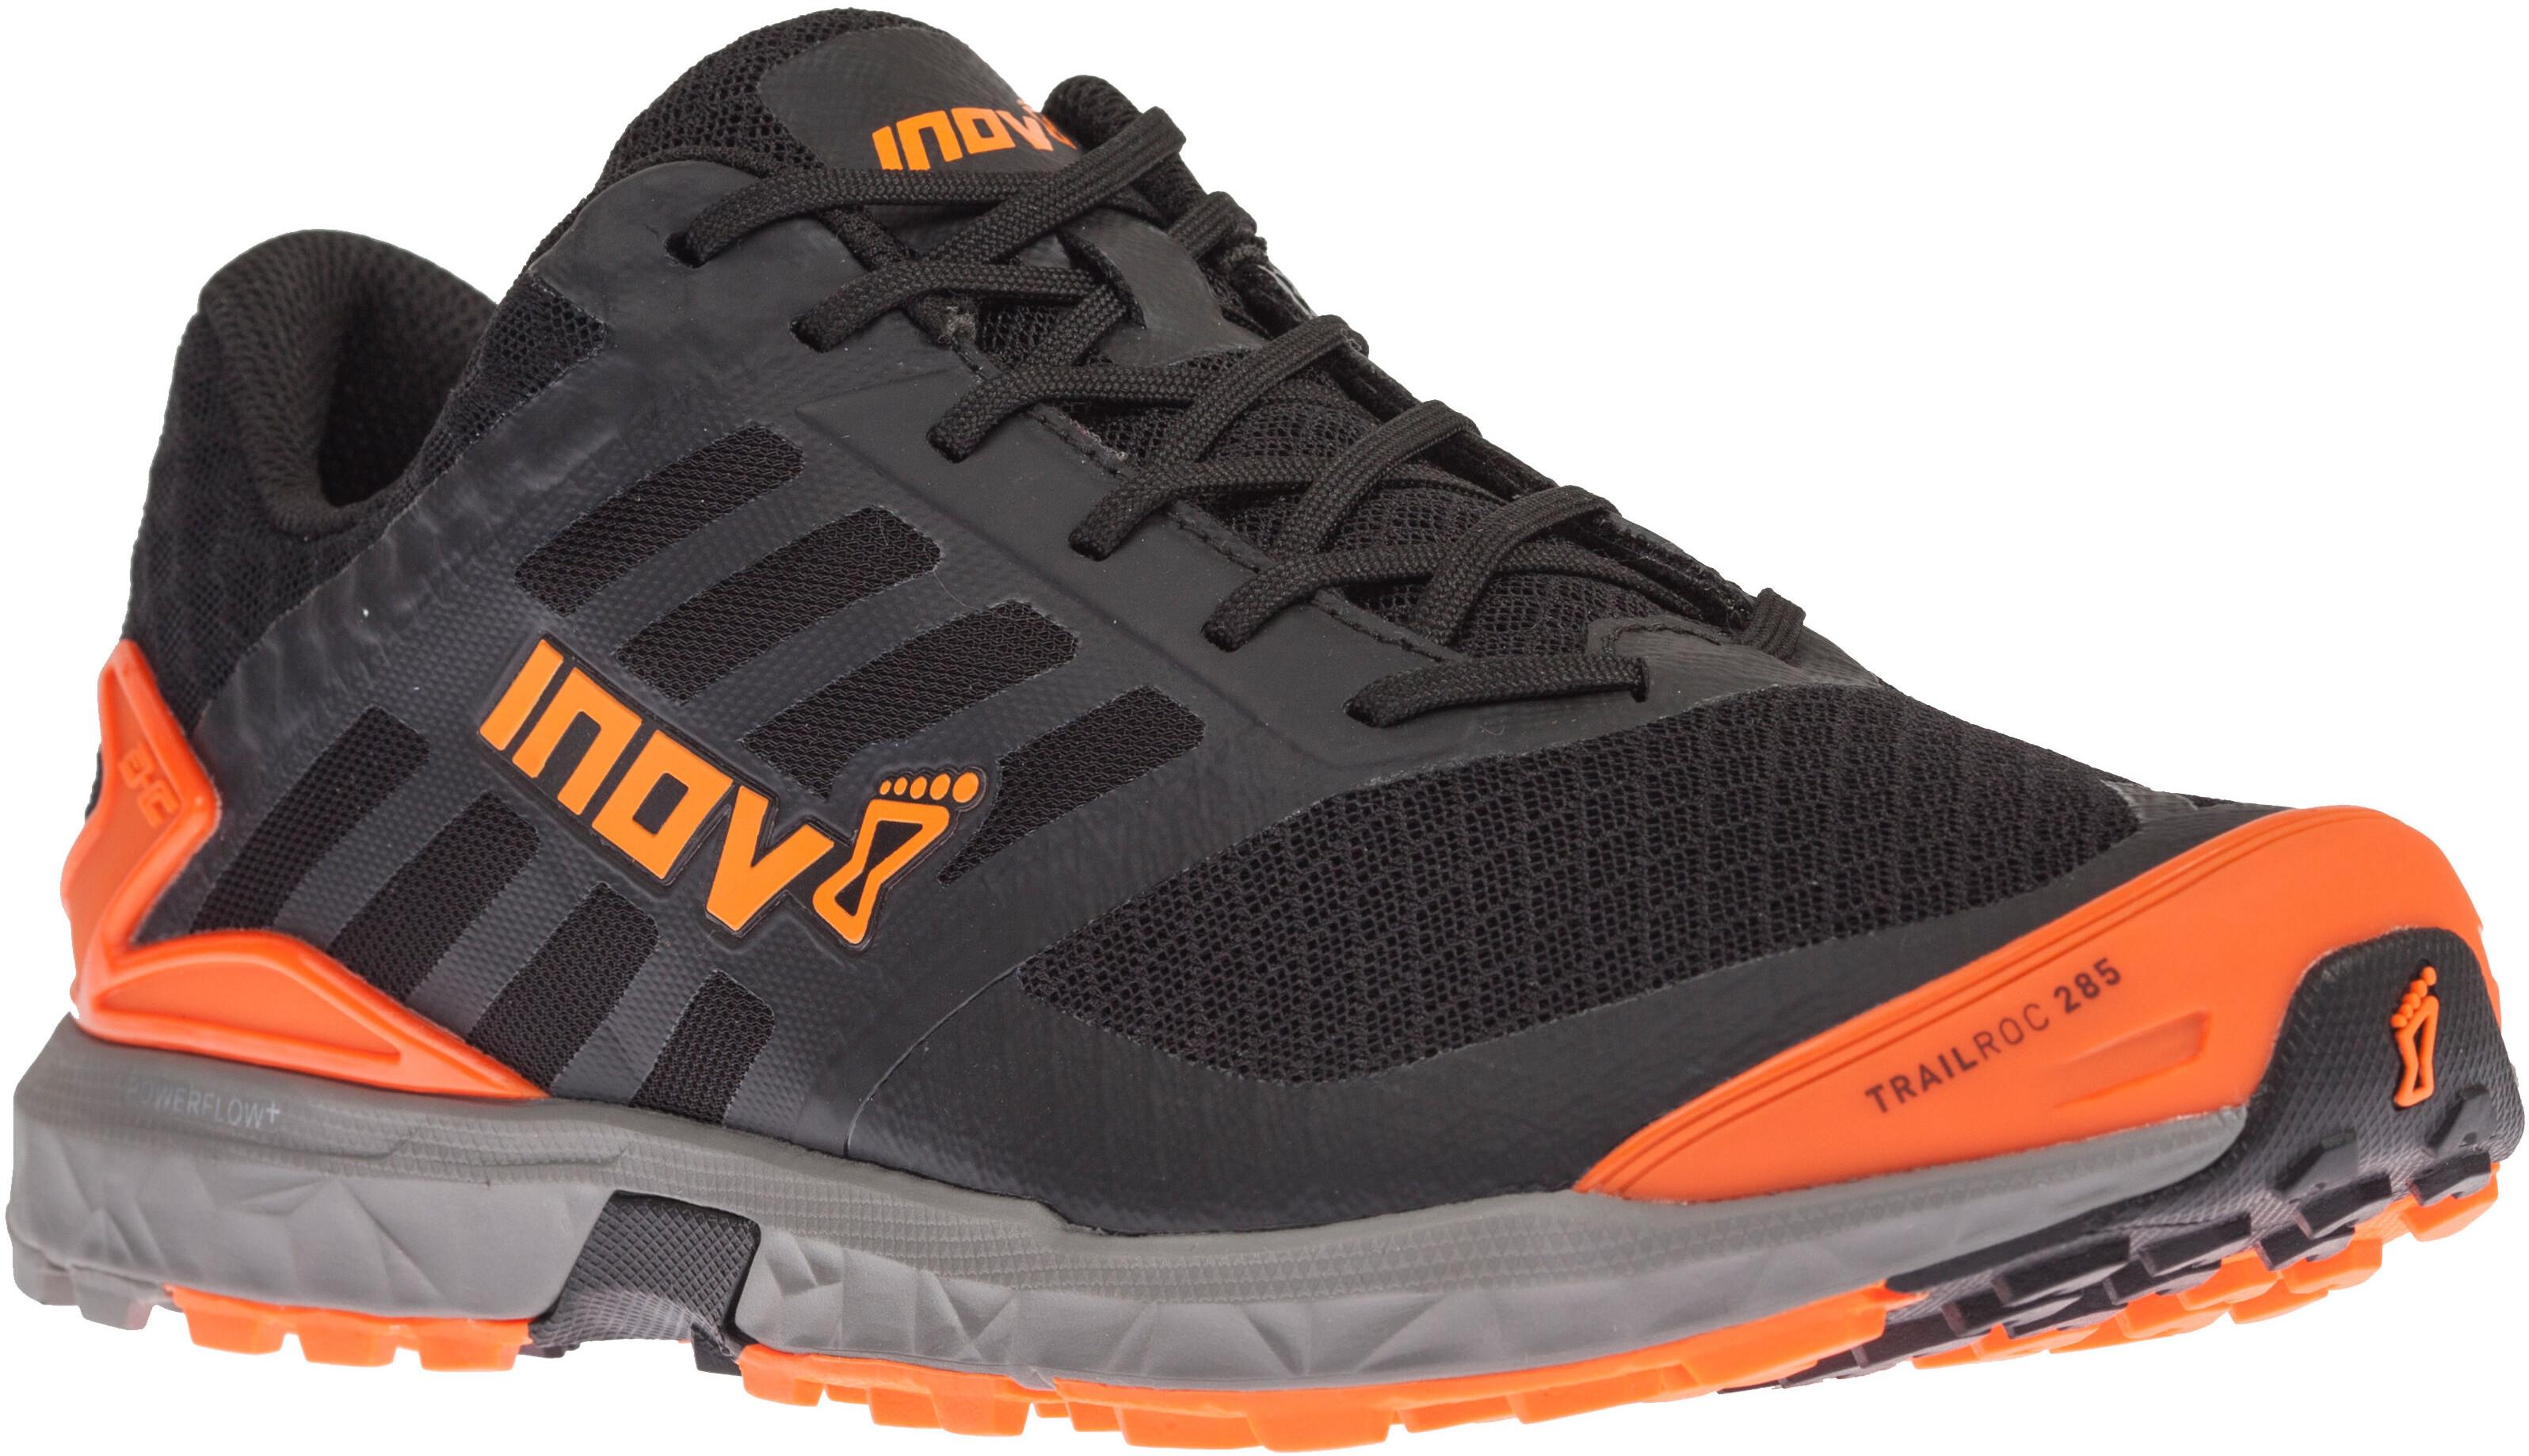 inov-8 Trailroc 285 - Chaussures running Homme - orange noir sur ... e2c27ea9e82b